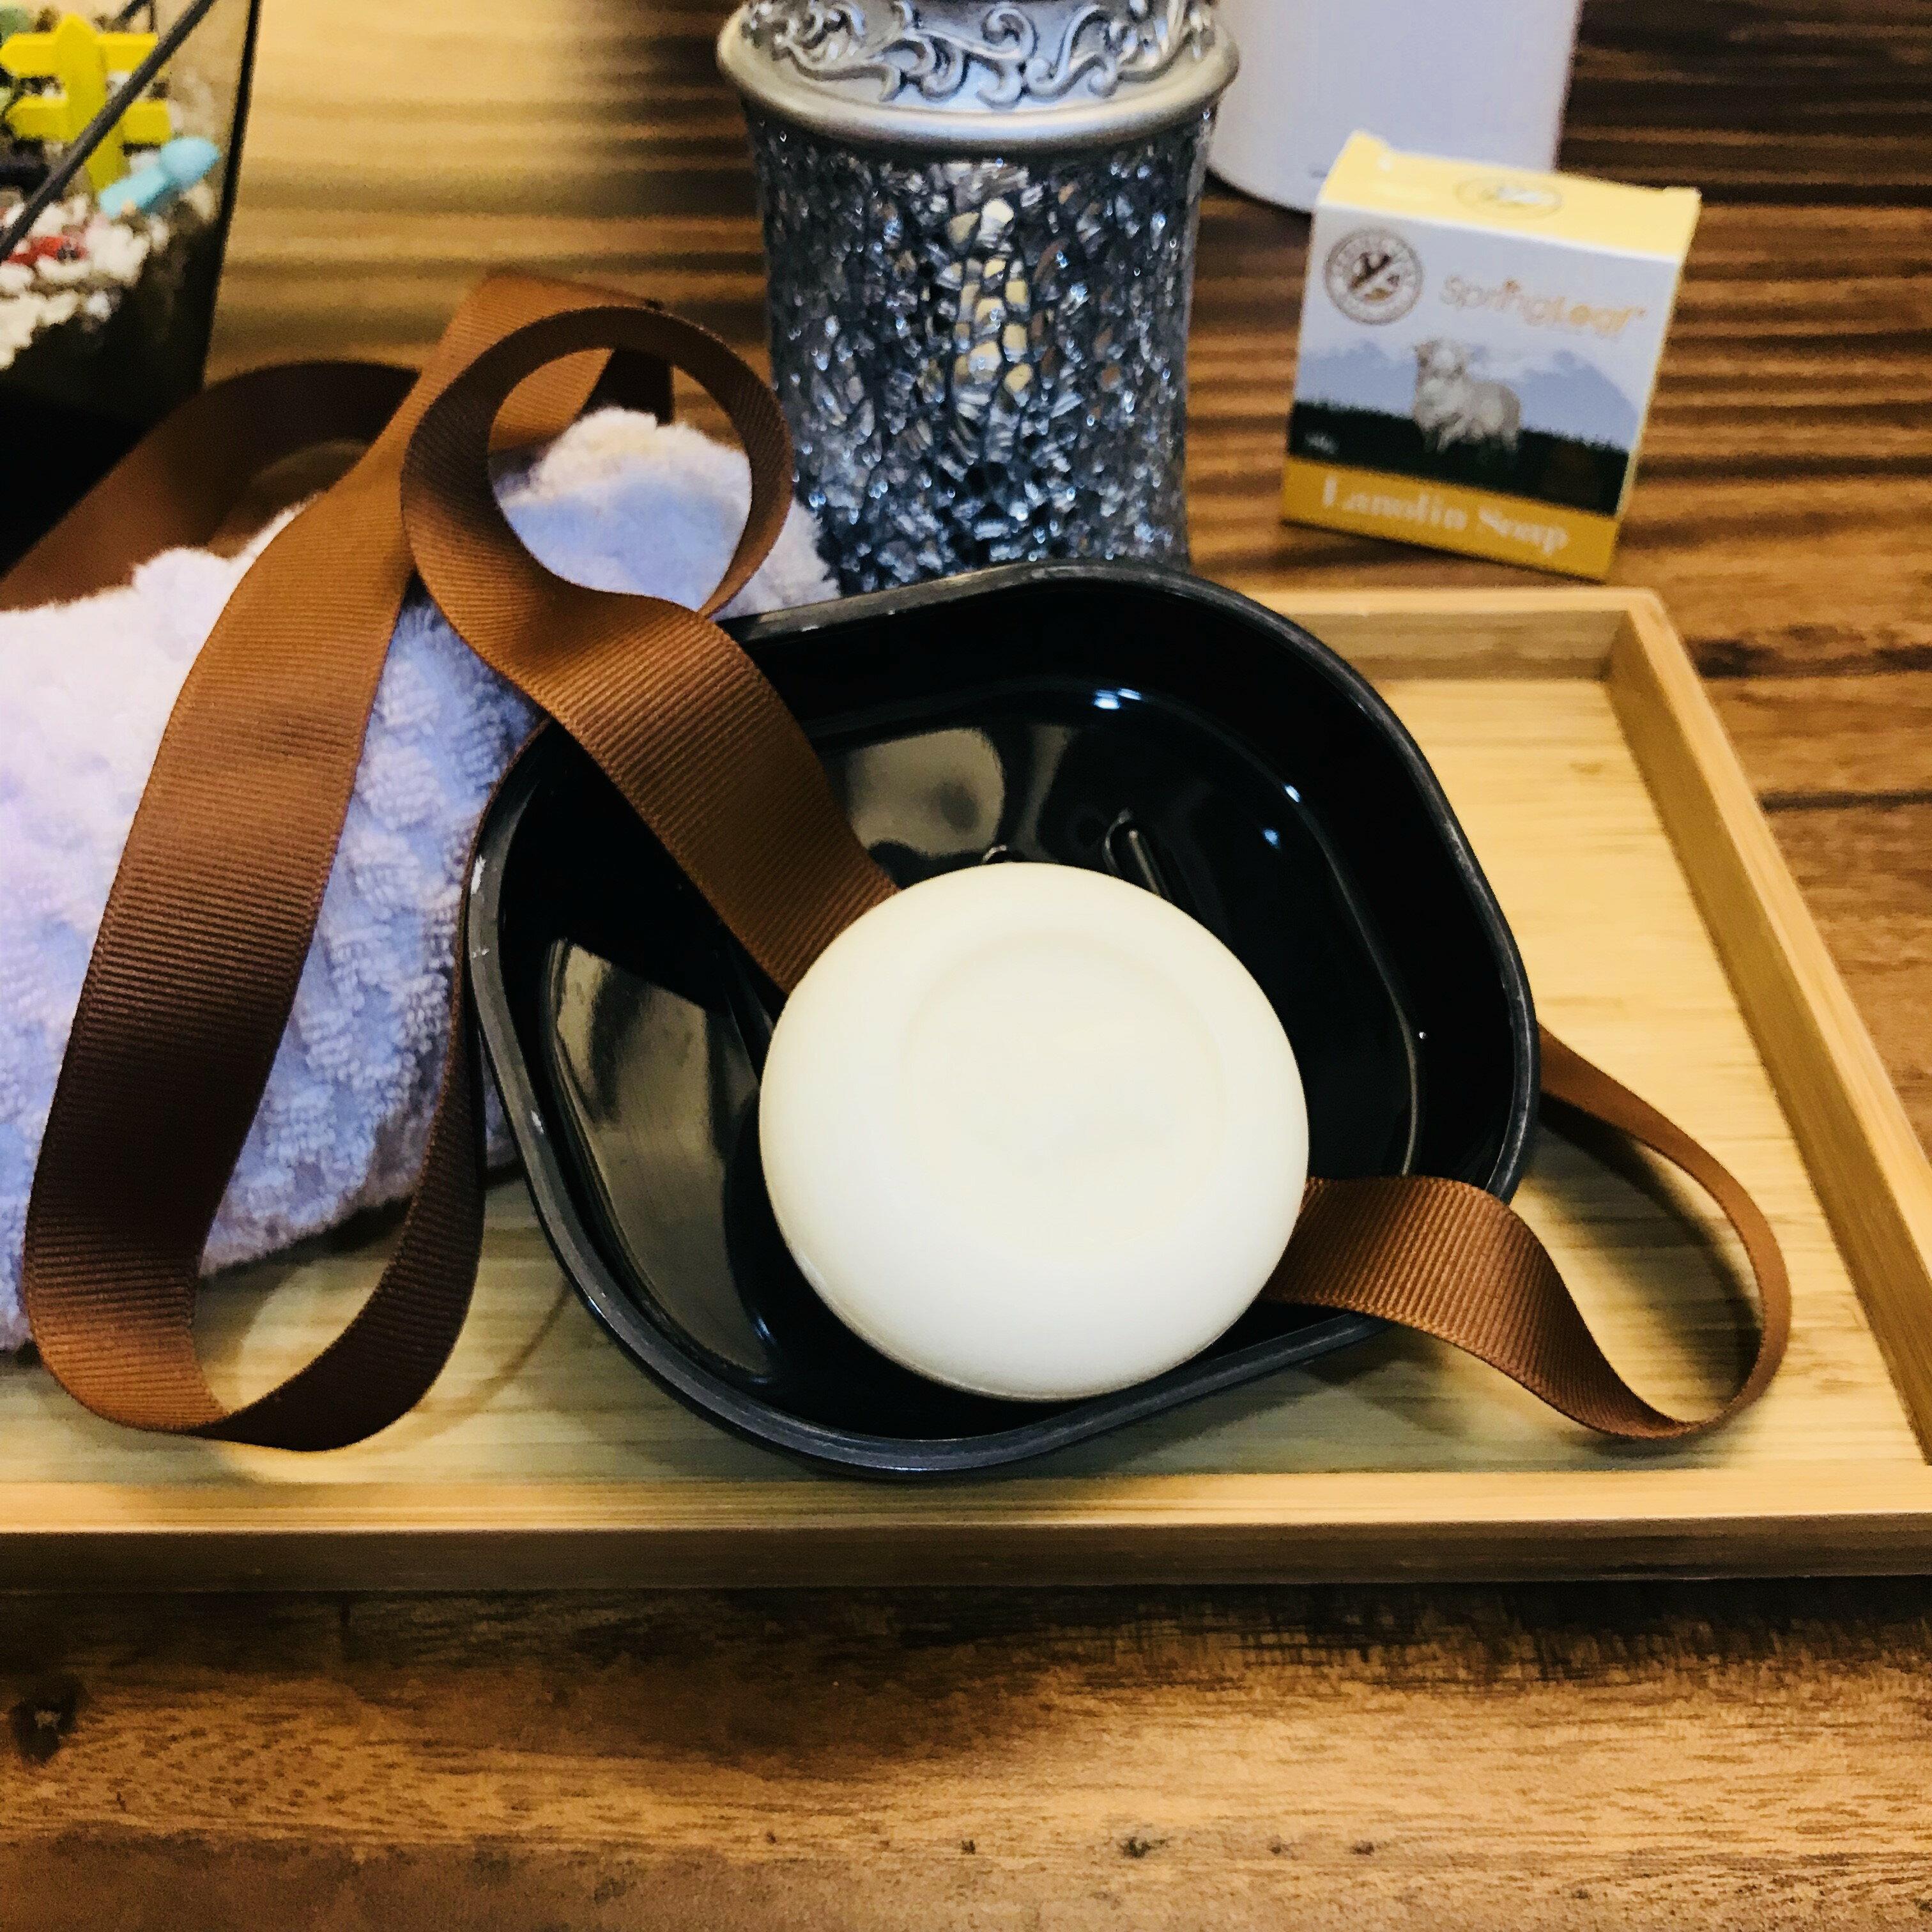 Nature's Joy  綿羊油保濕皂80g (3入) / 保濕皂 / 綿羊油 / 孩童用肥皂 / 天然保濕因子 / 澳洲原裝 肥皂 1